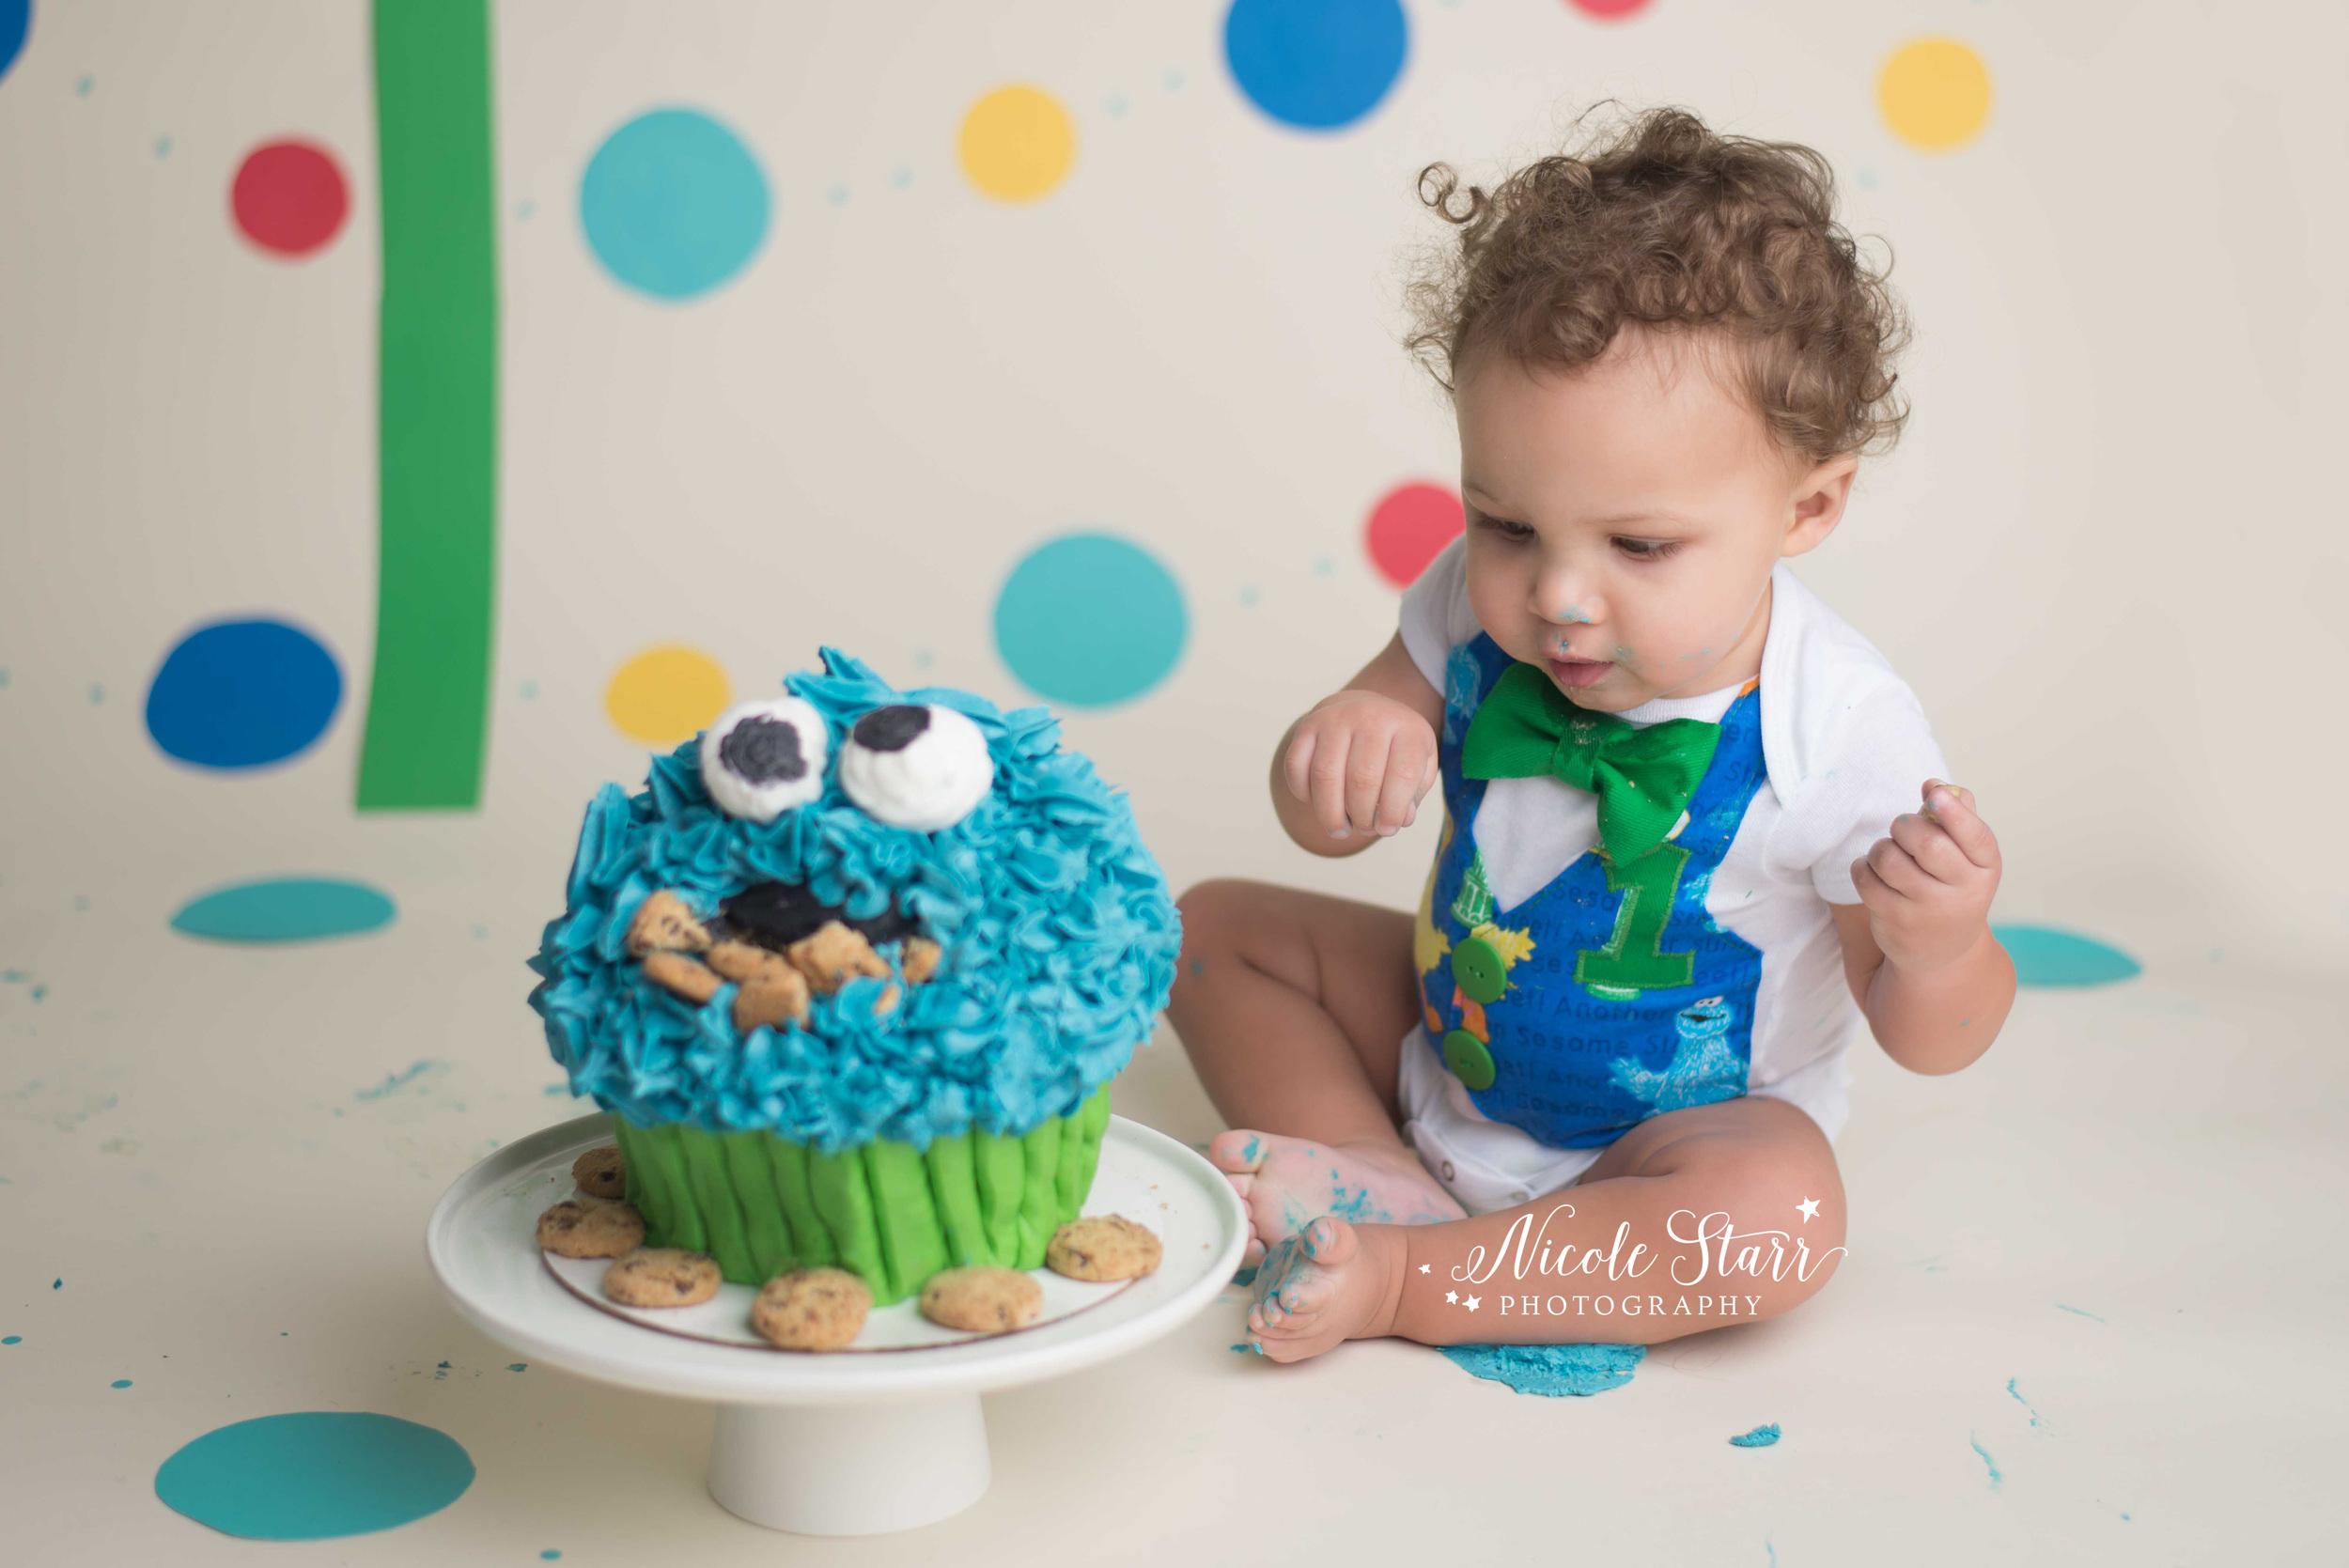 cookie monster cake smash baby portrait photographer.jpg